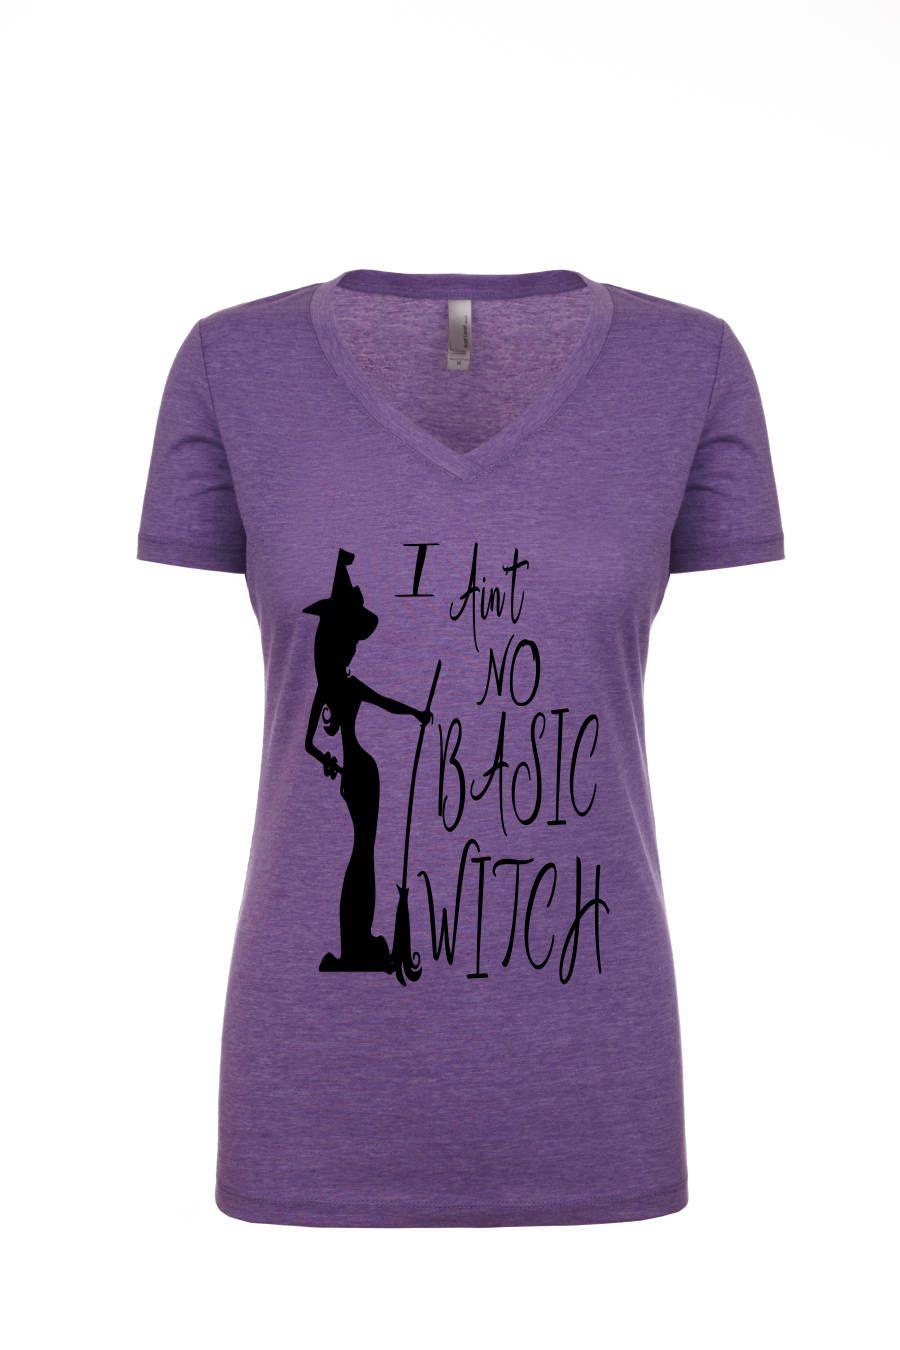 eecb22f37 Basic Witch, Halloween Shirt, Halloween Tee, not a basic witch, purple tee,  halloween graphic, halloween shirt, womens shirt, graphic tee by  jilovalcustoms ...